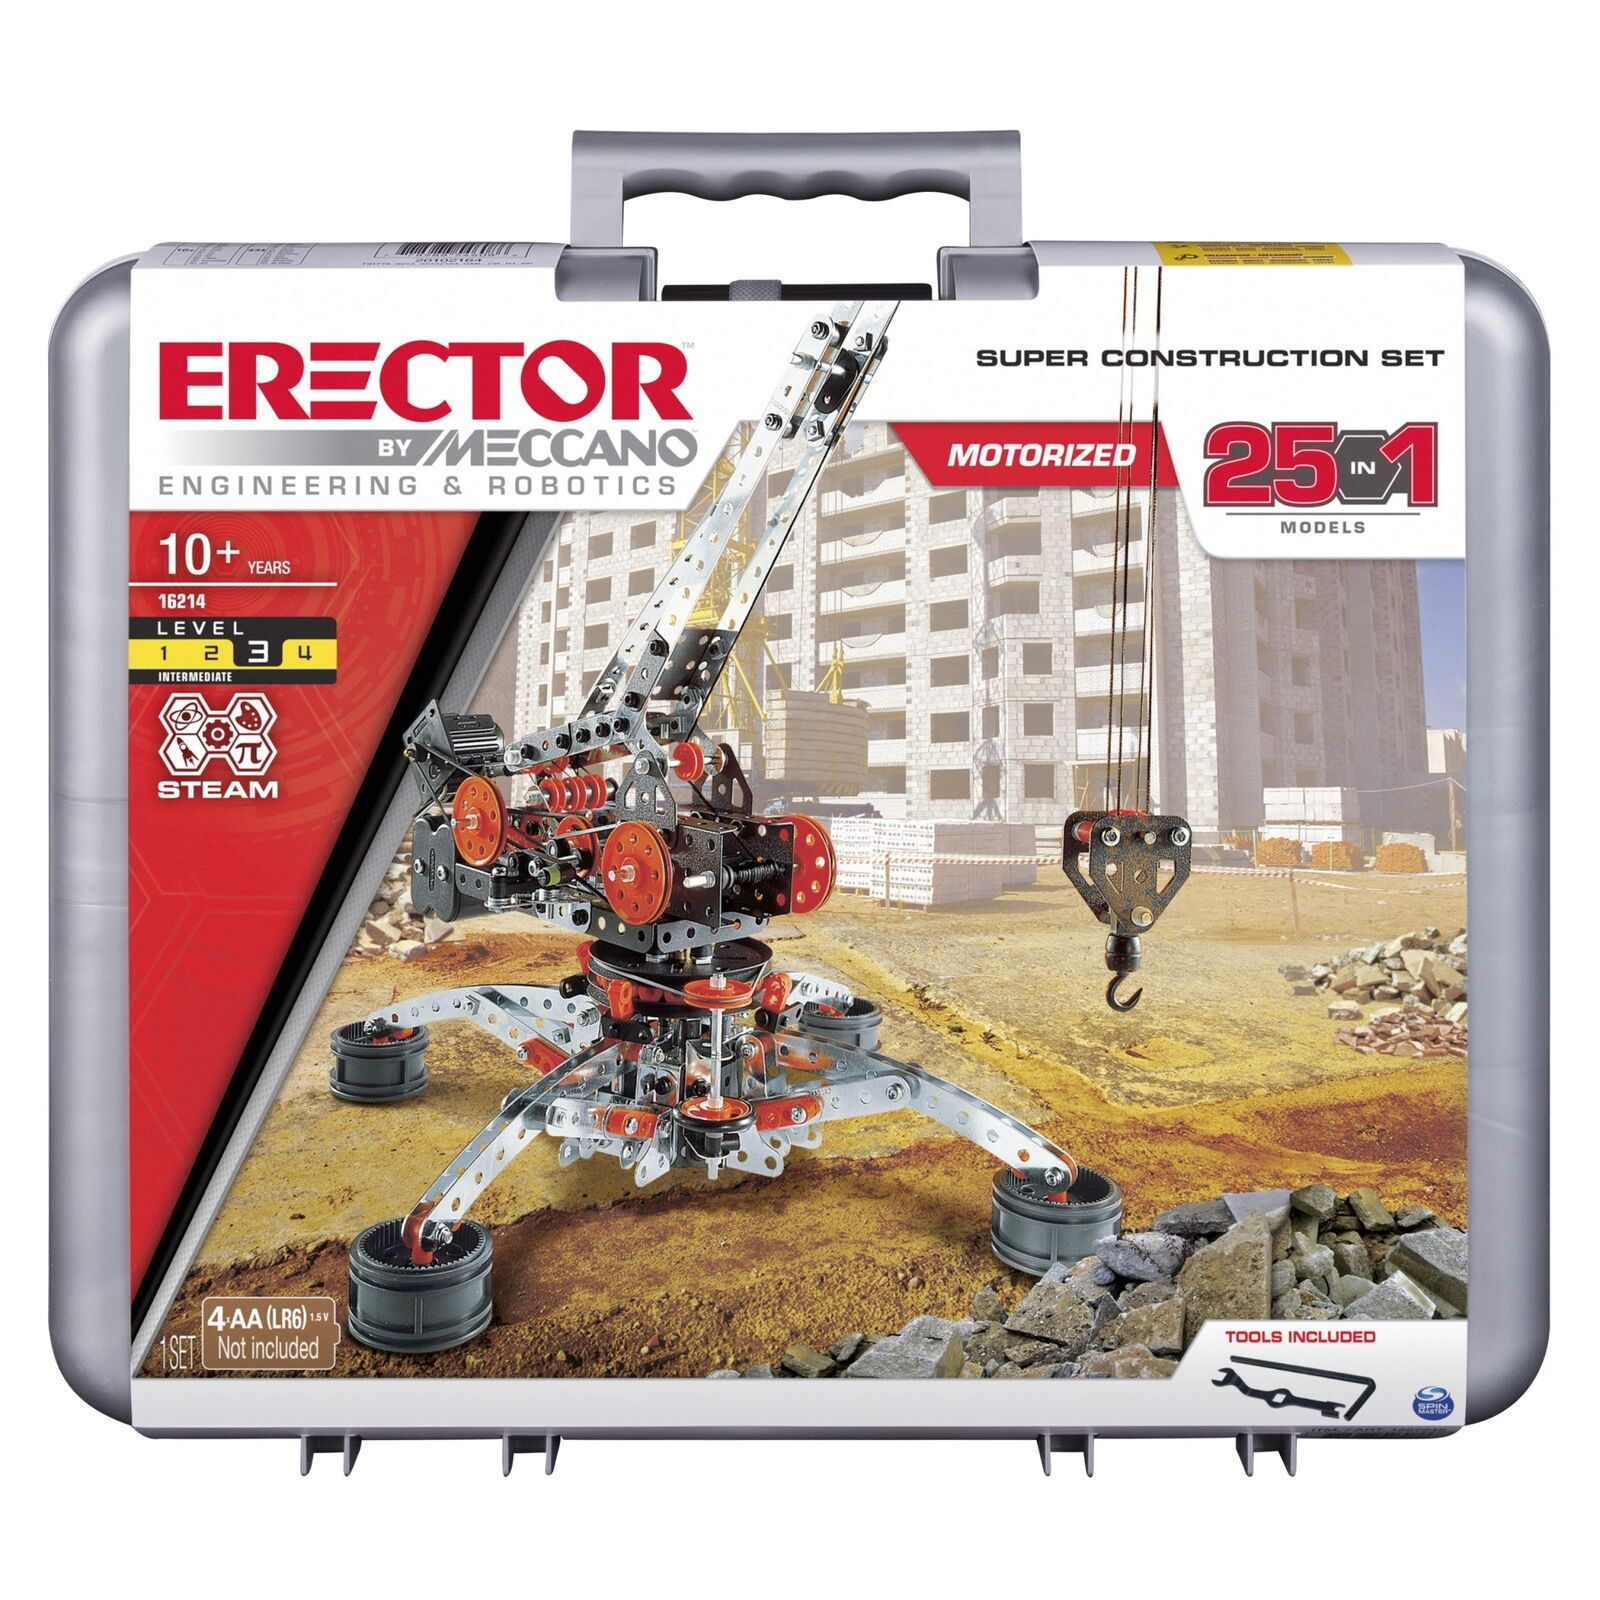 Erector by Meccano Super Construction 25-in-1 Motorized Building Set, STEM Educa